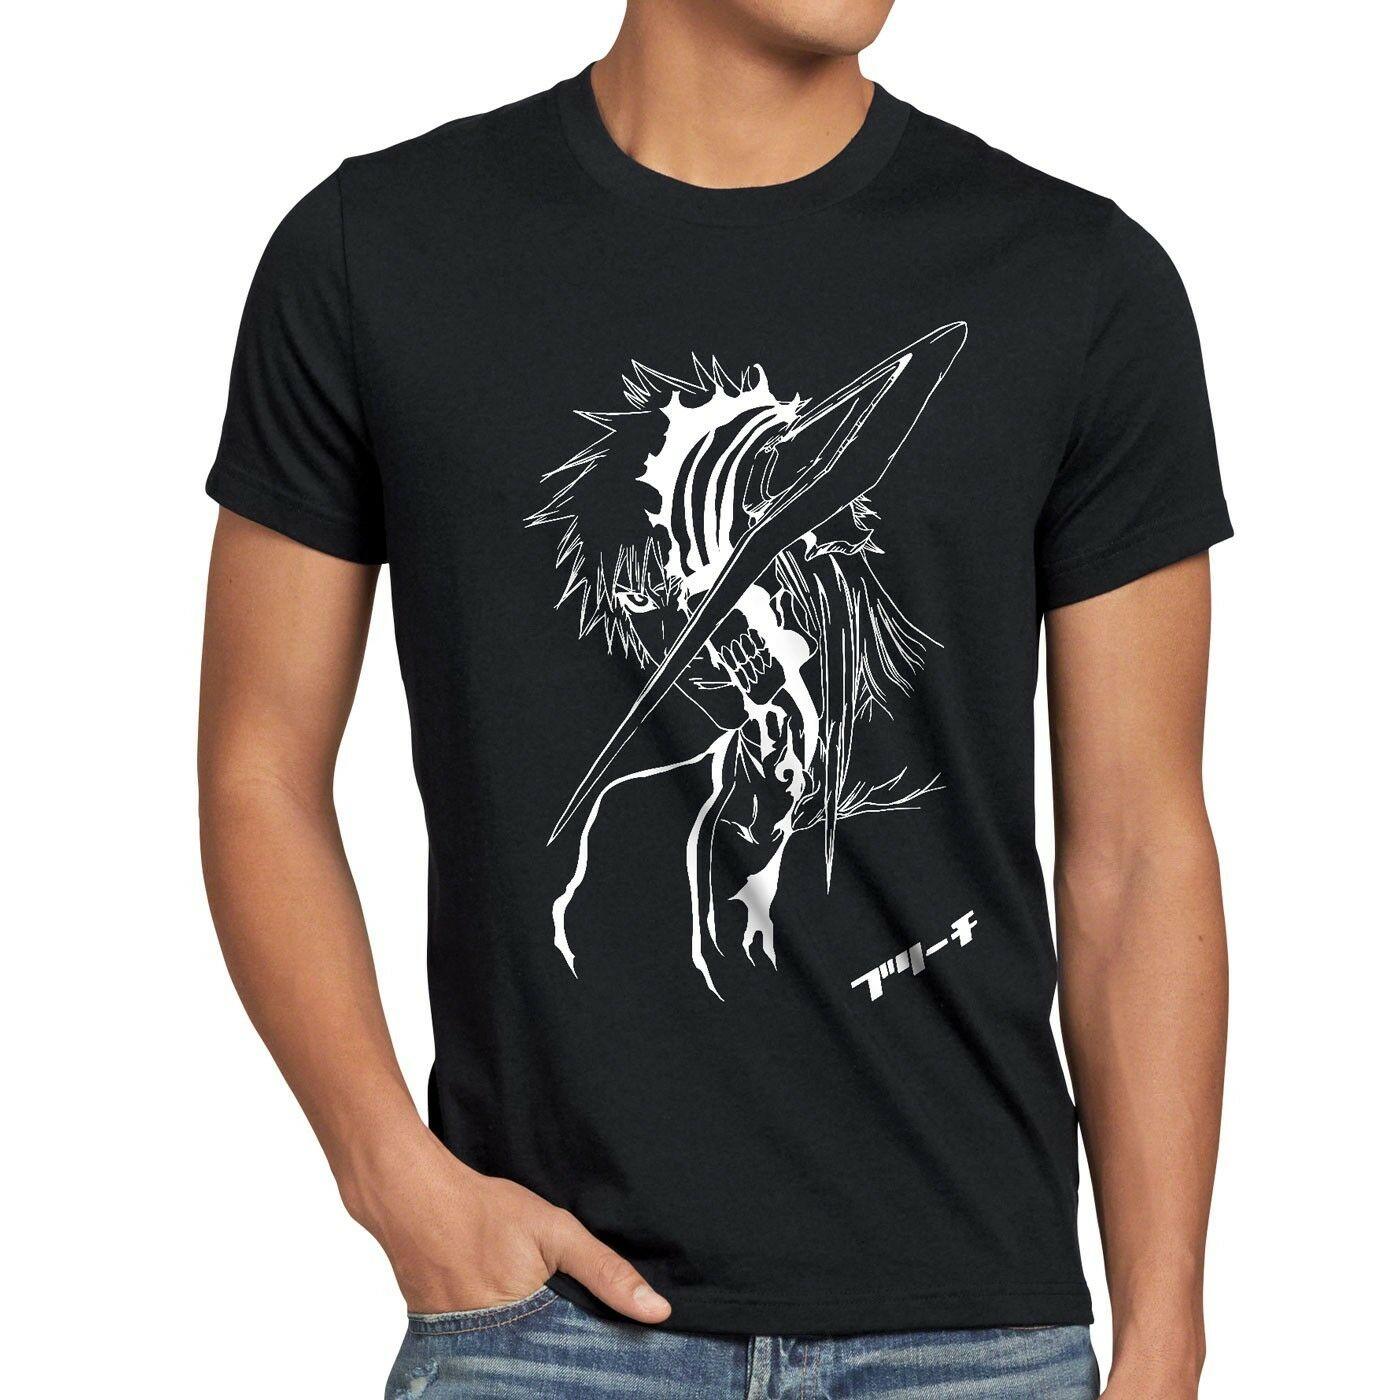 Camiseta Ichigo Herren, camiseta de dibujos animados kurosaki rujia, calada, con lejía Shinigami, Unisex, nueva camiseta de moda, gratis